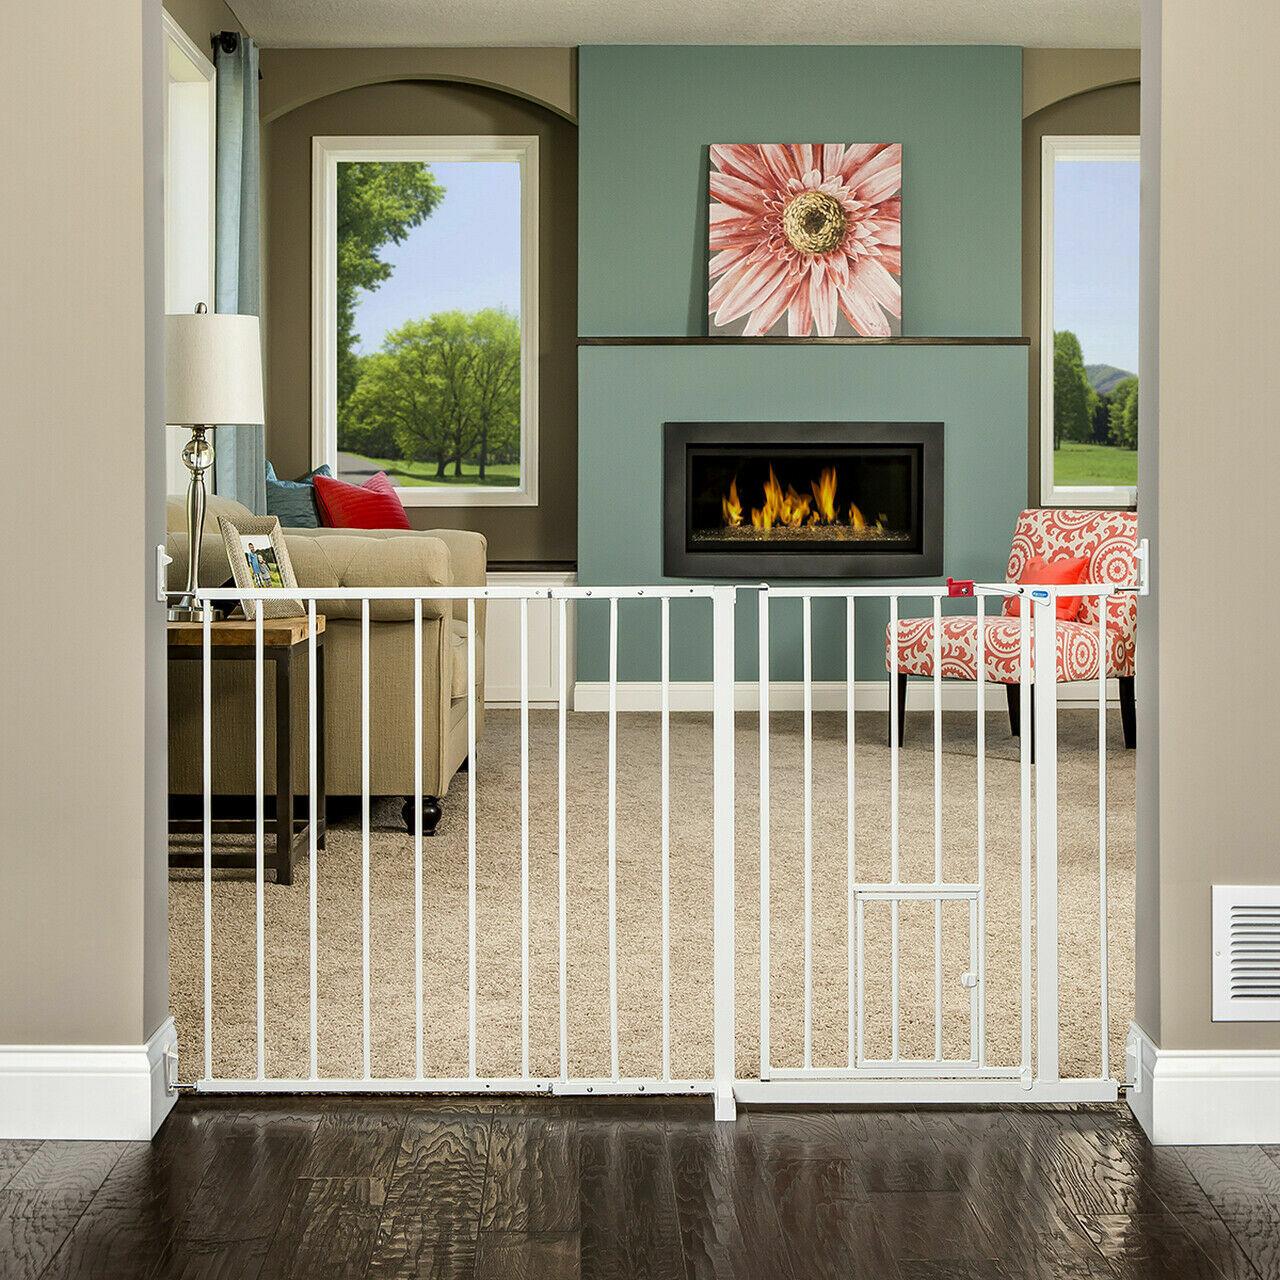 Carlson Maxi Walk Through Pet Gate, 50-59 Inches Wide, Hardw